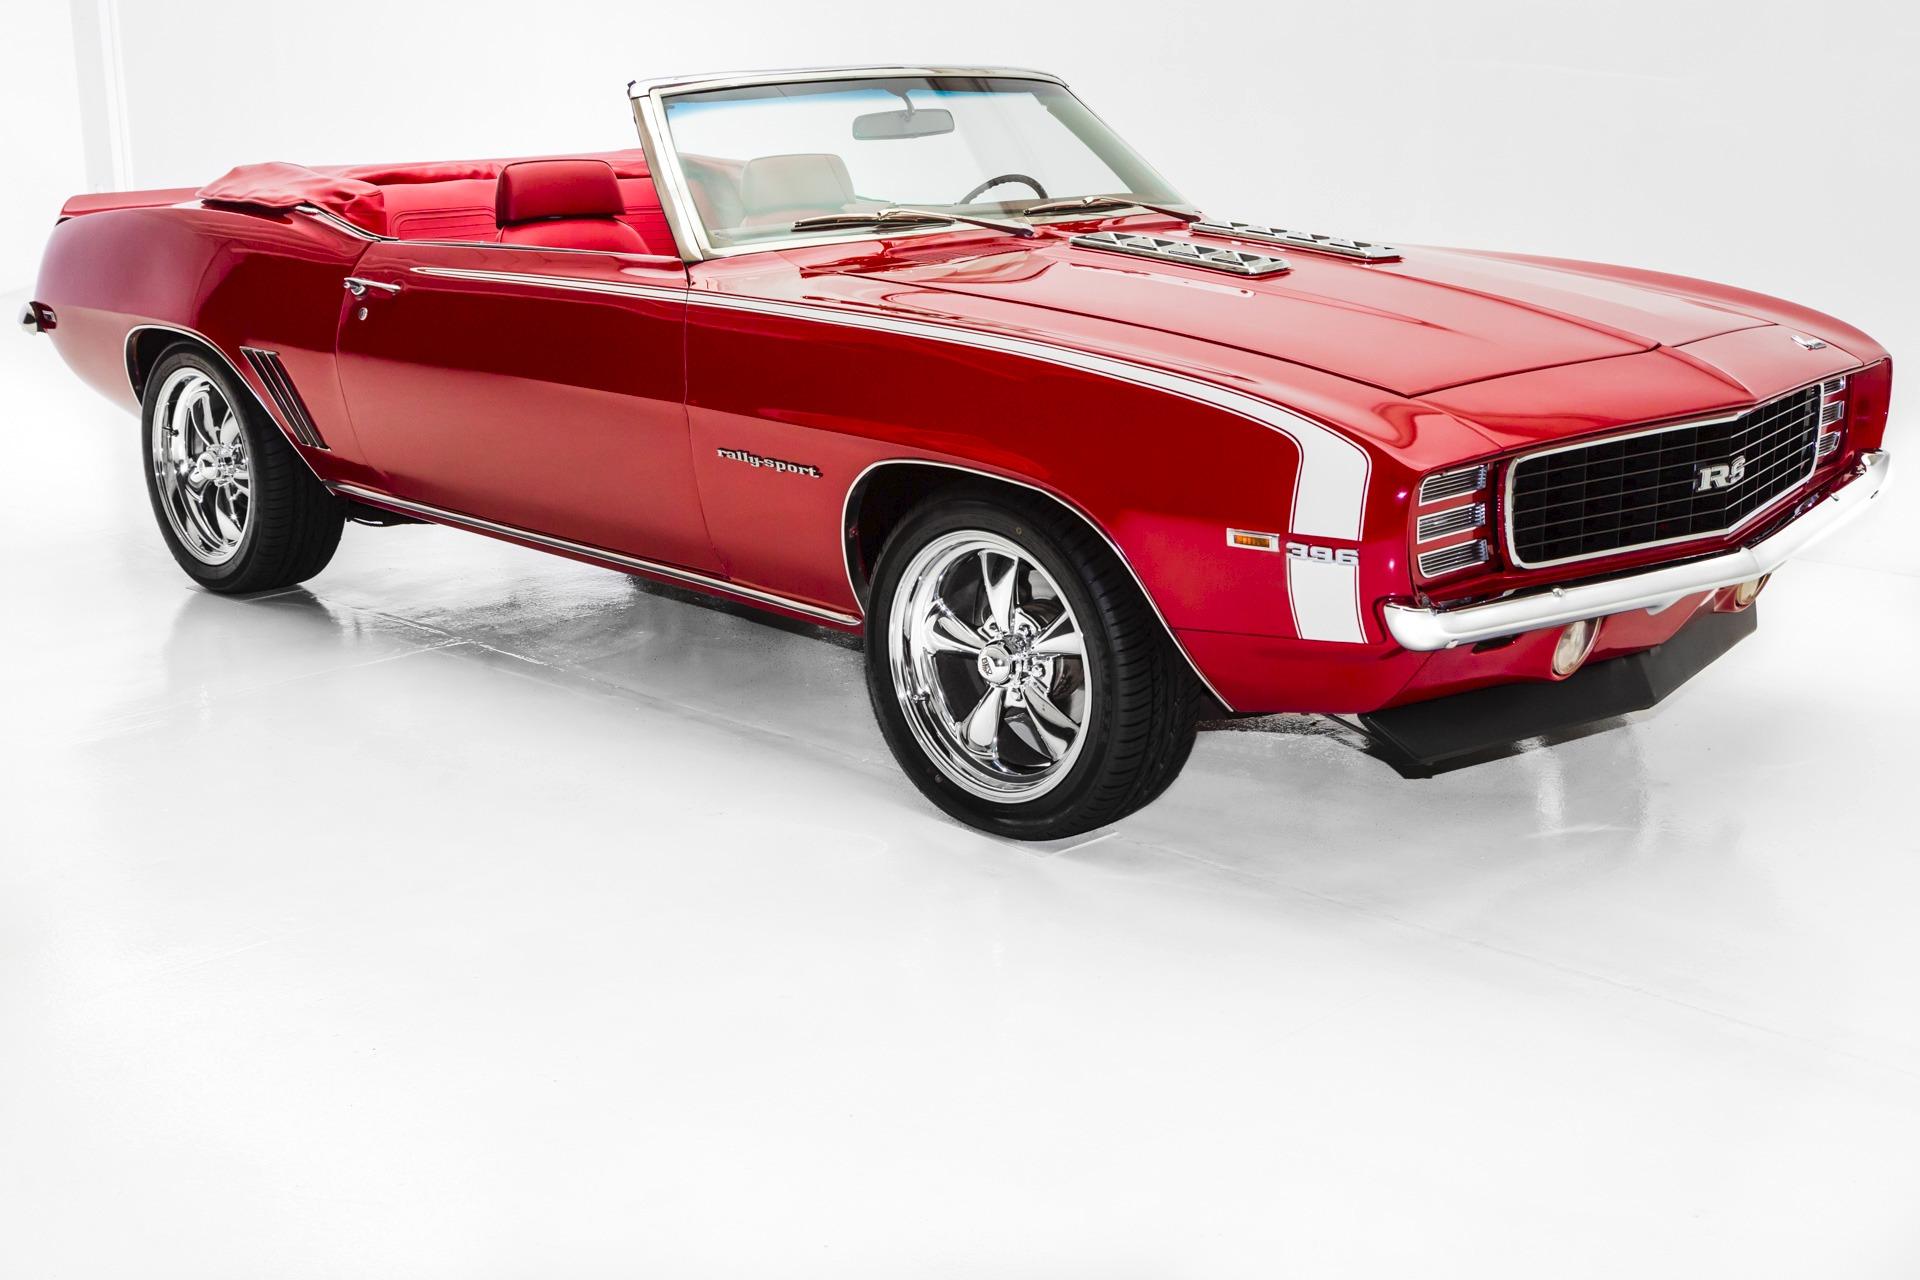 1969 Chevrolet Camaro Convertible 396 4 Spd Rs